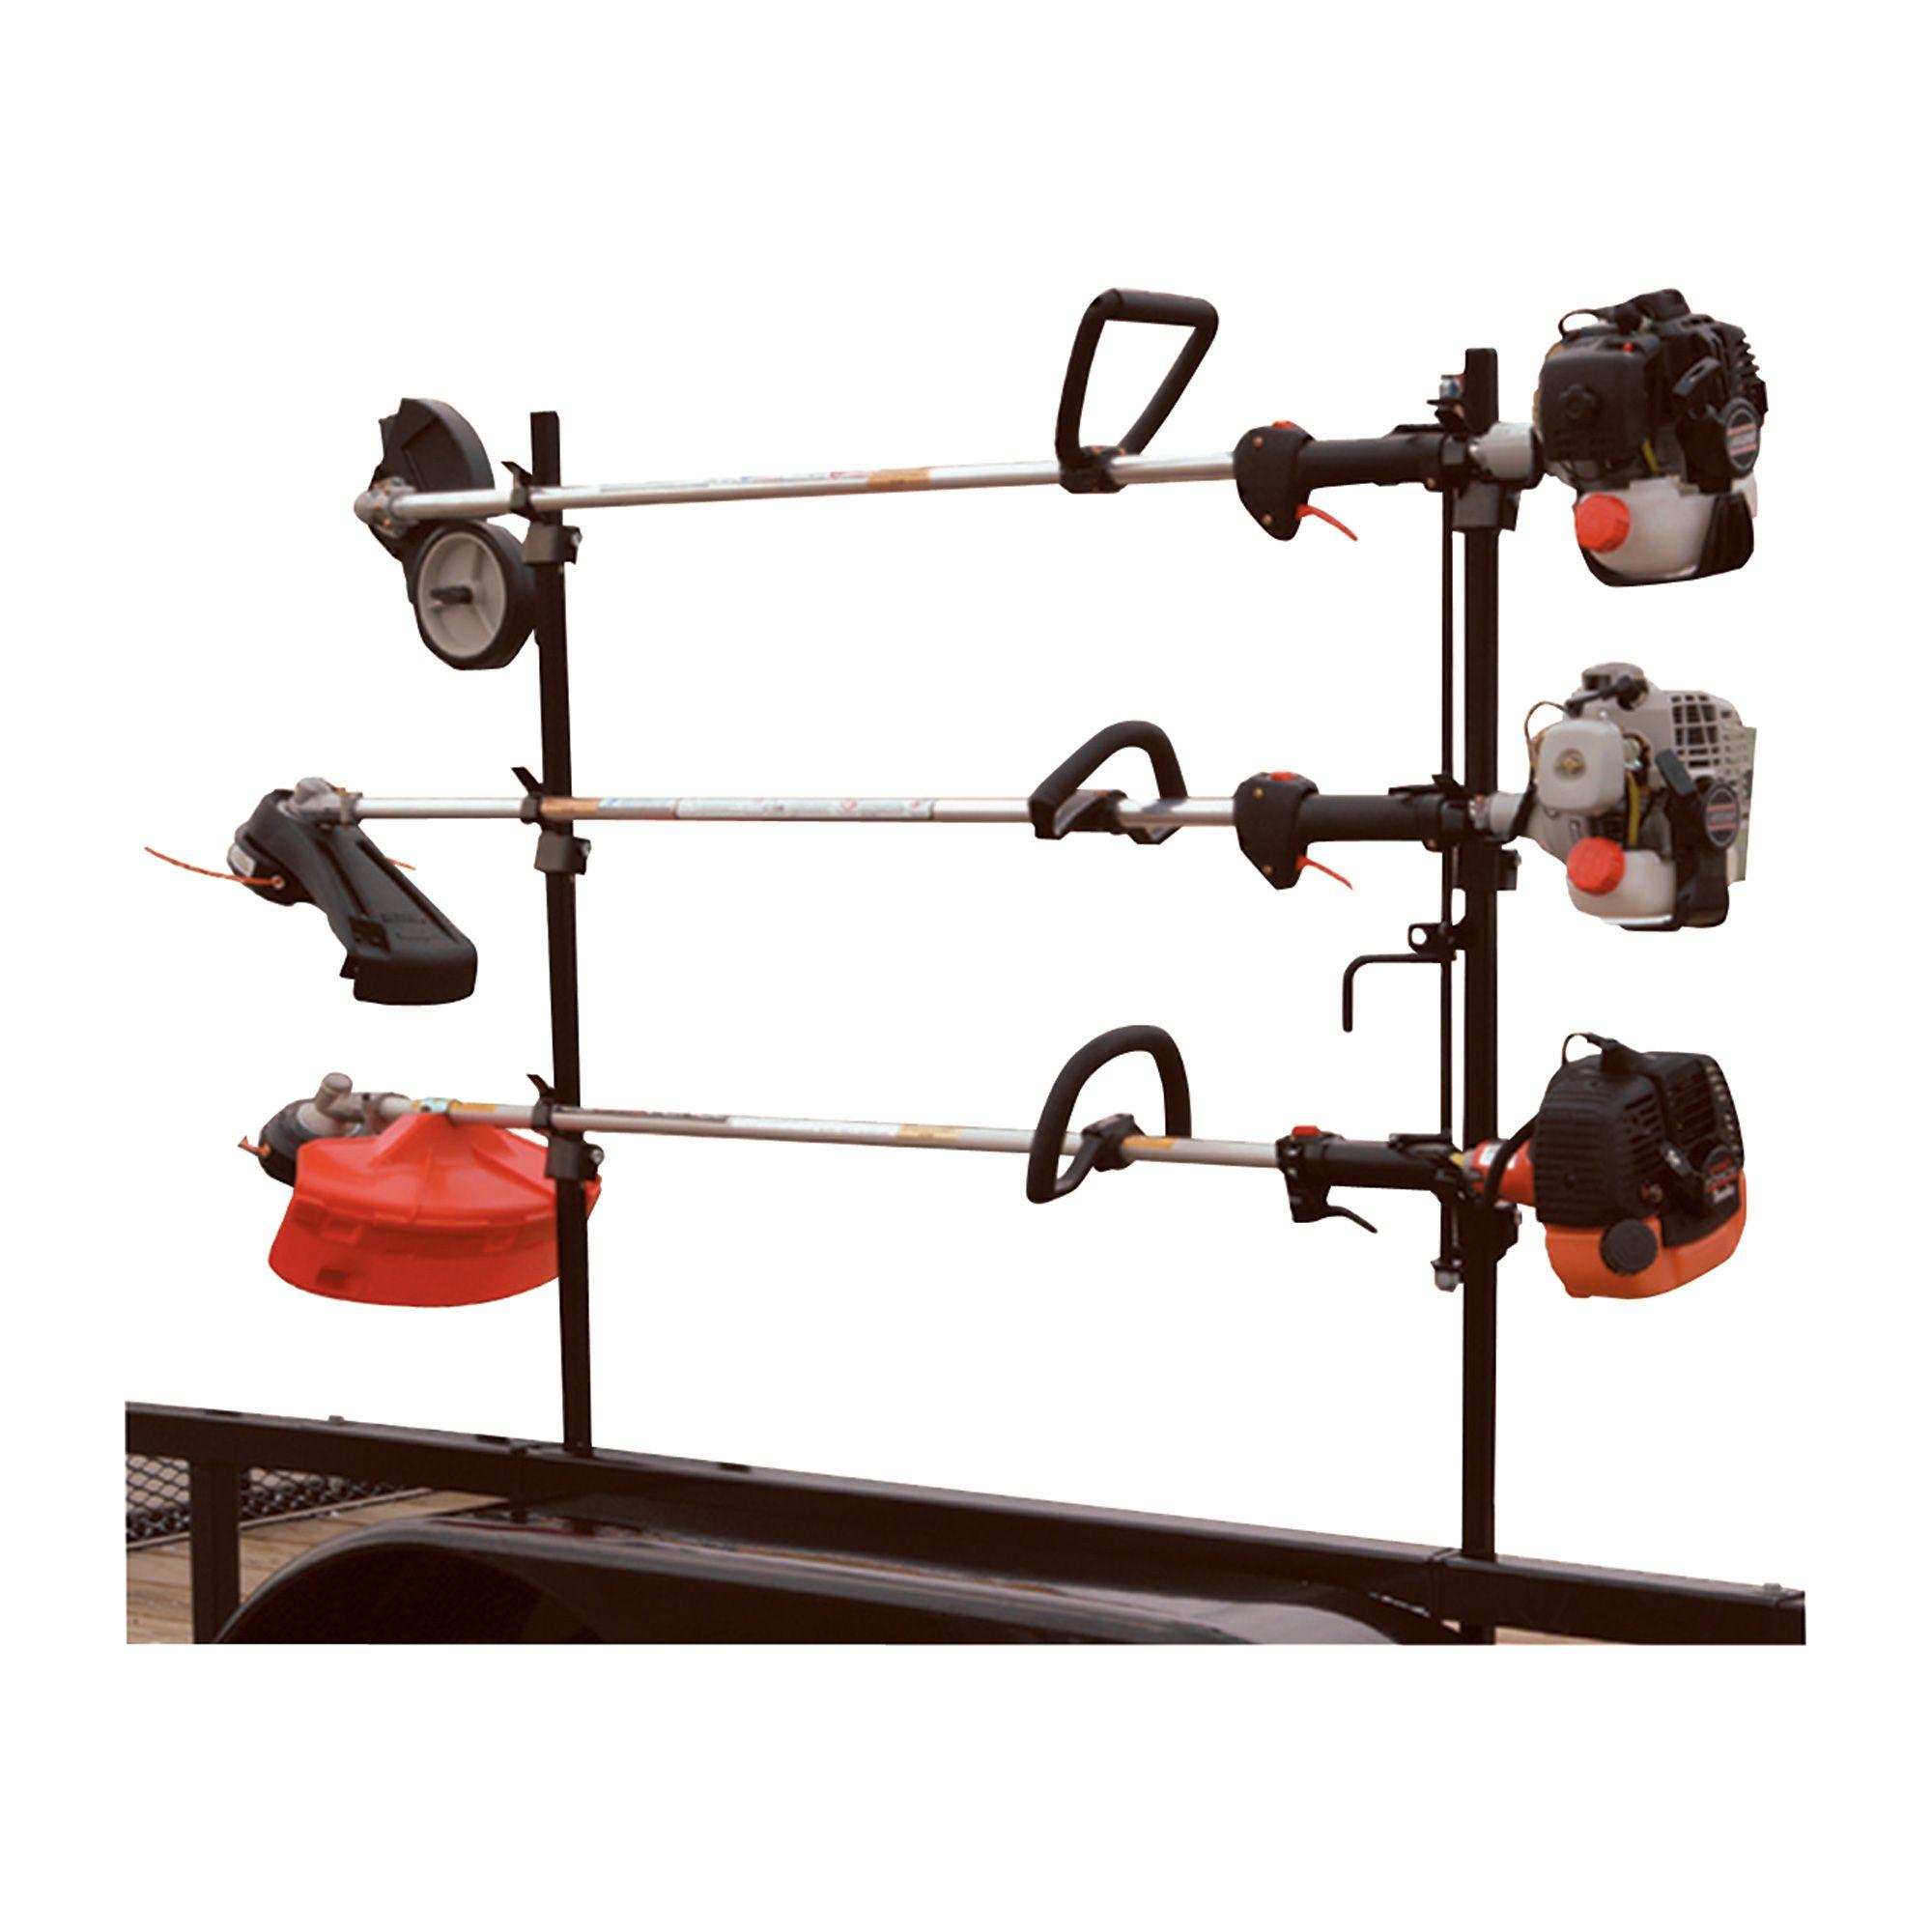 Buyers Lockable Trimmer Rack for Open Trailers Model LT10